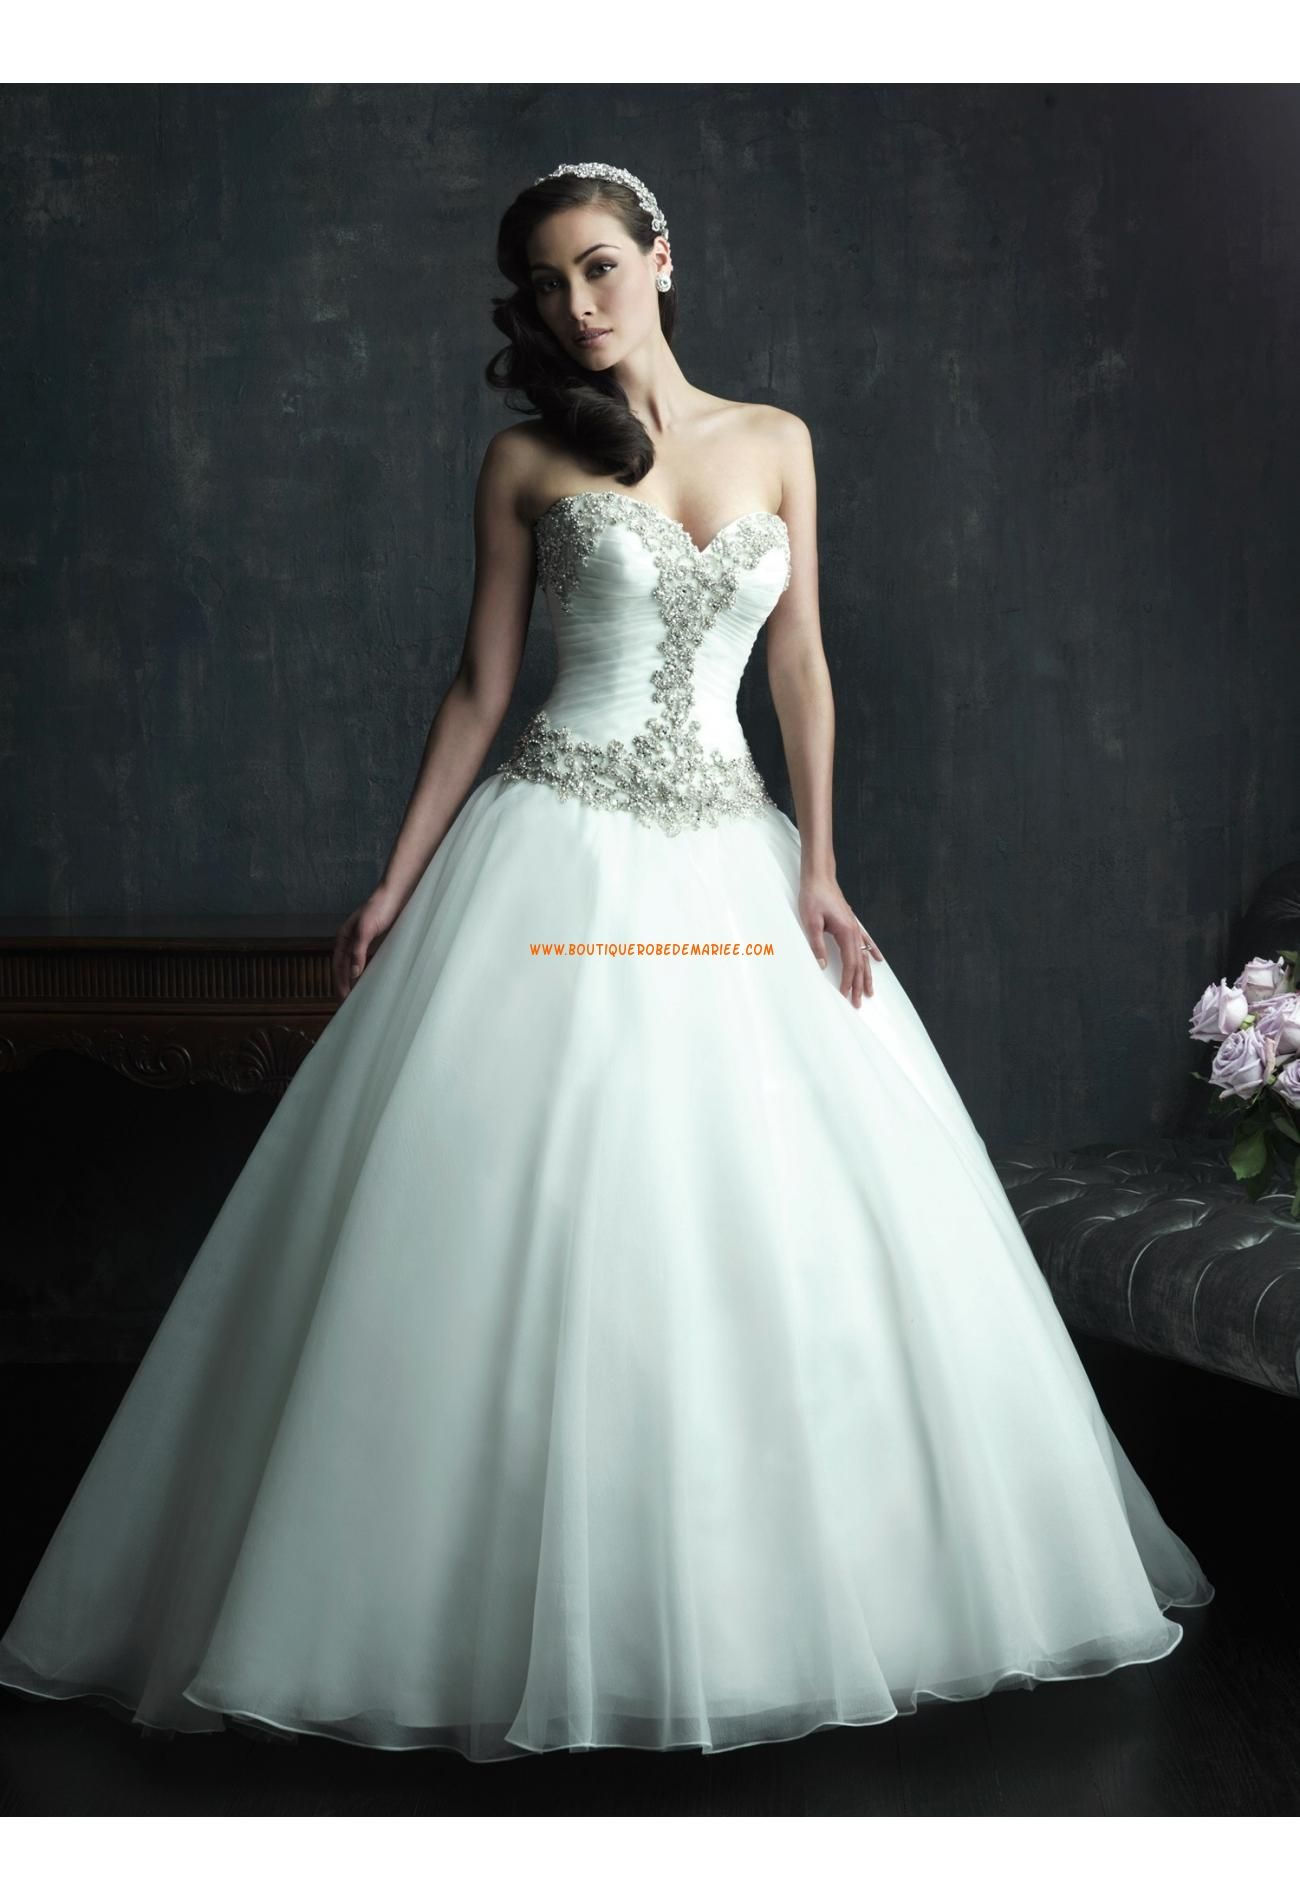 Robe de mariée organza avec bustier perlé cristal col coeur